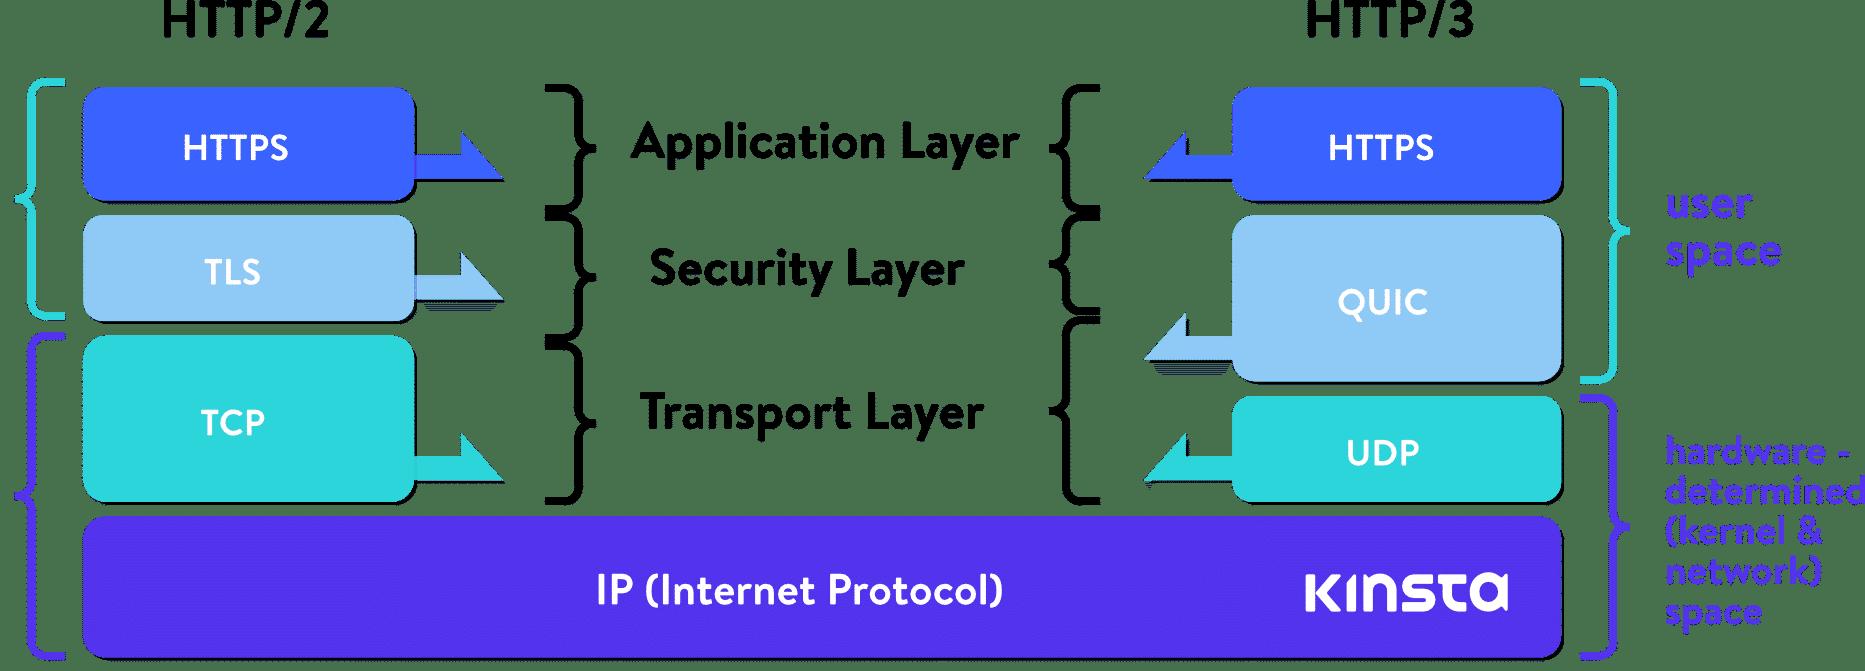 Pilha HTTP/2 versus pilha HTTP/3